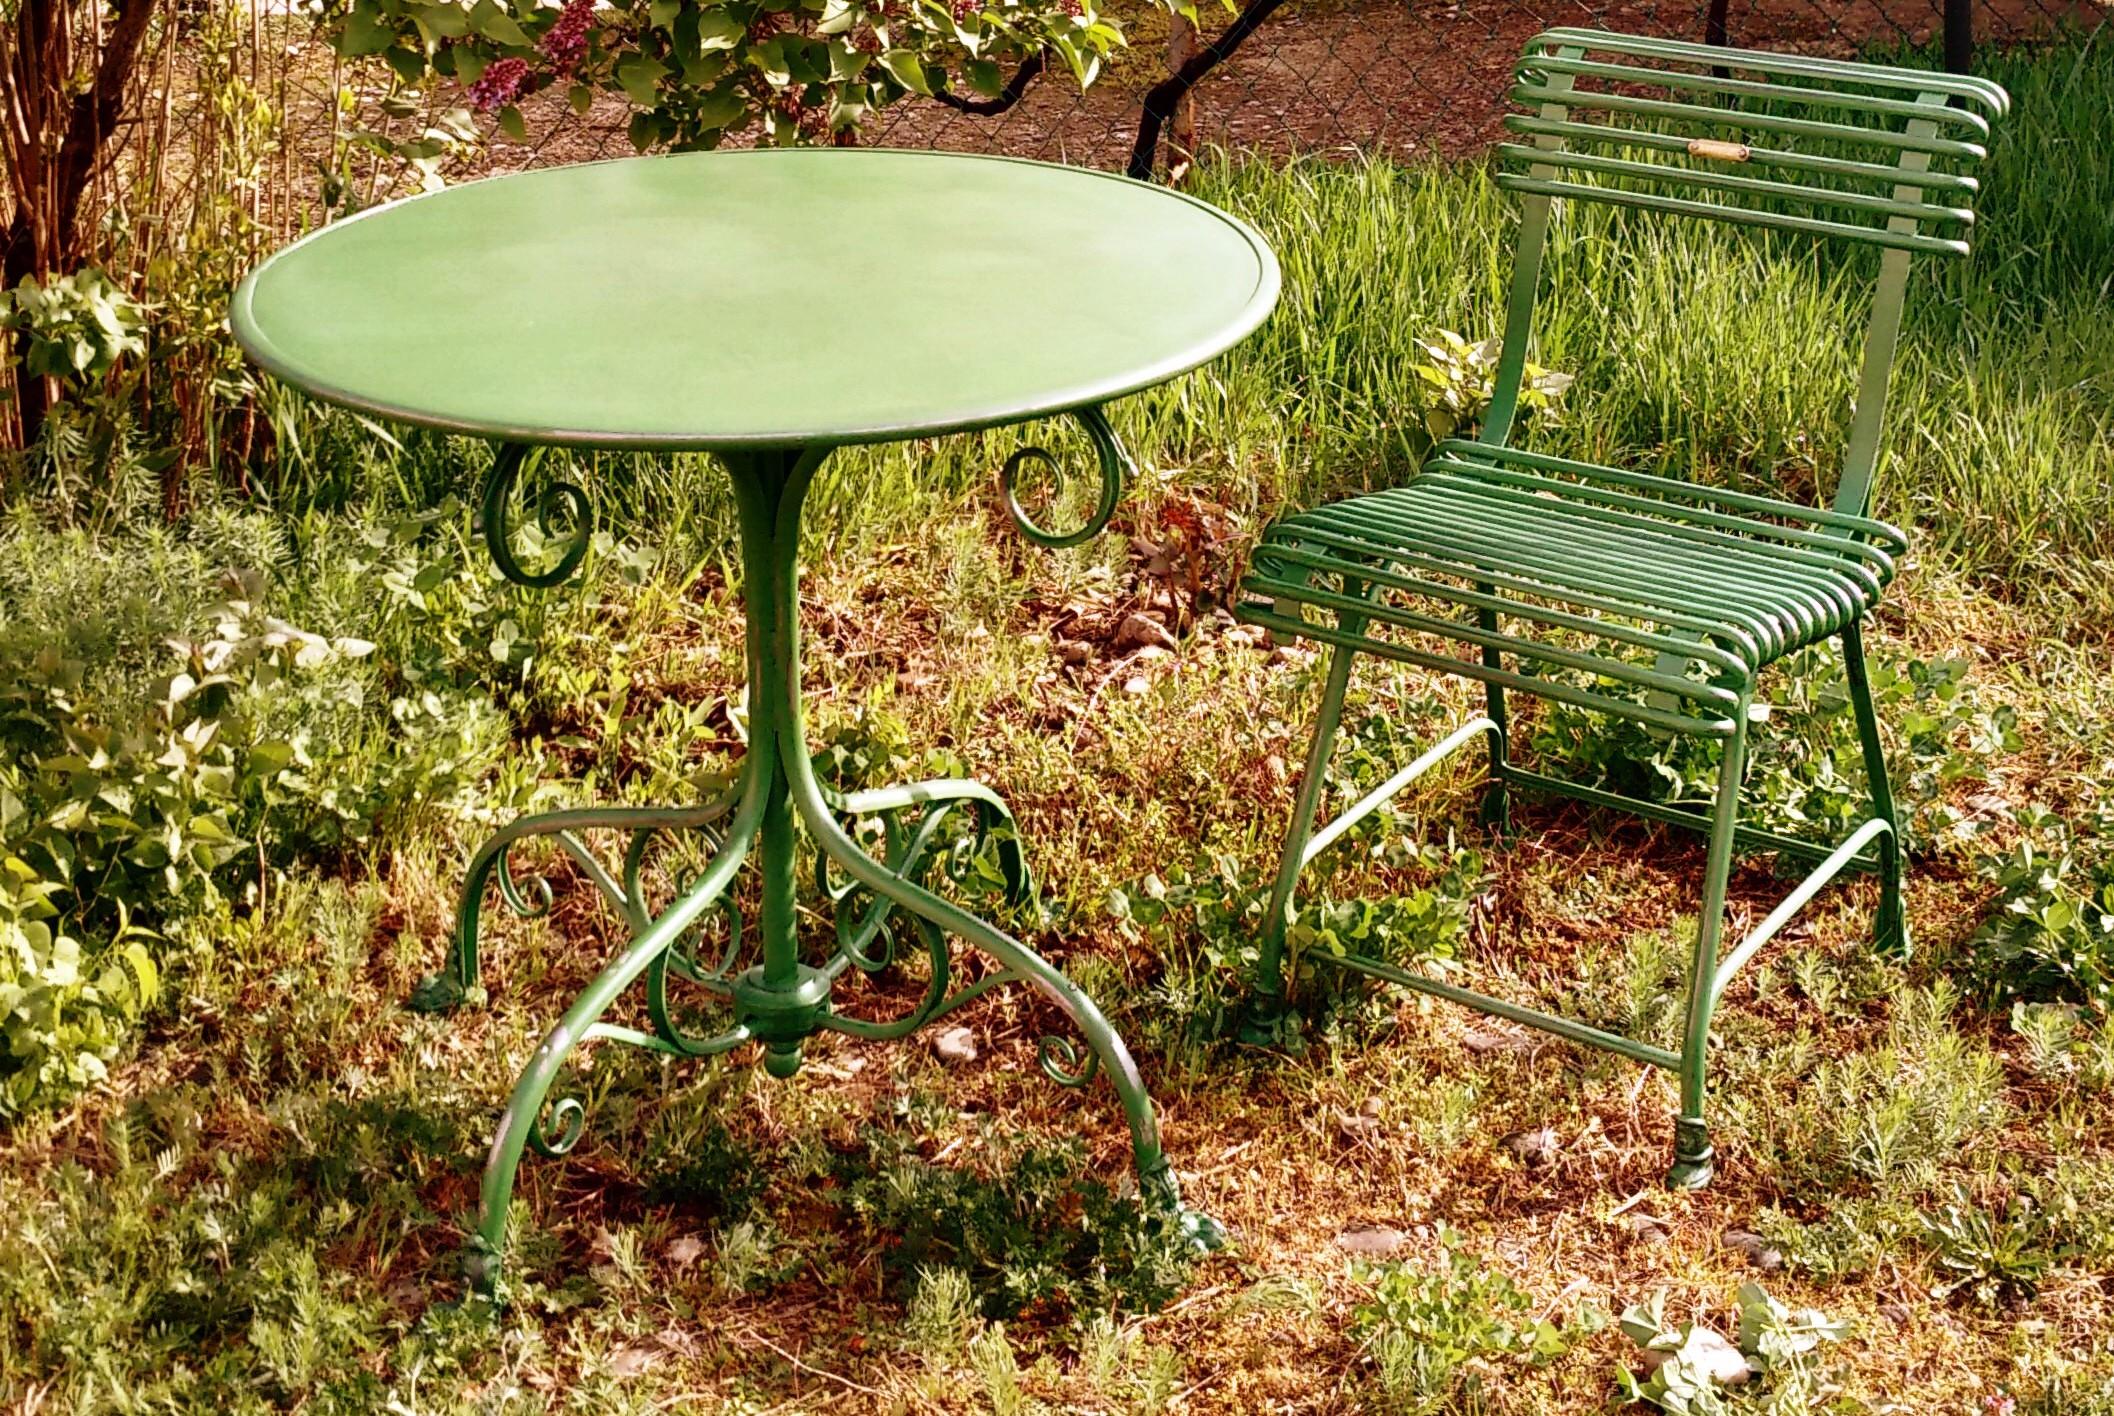 T80 table de jardin ronde pieds griffe - Griffe de jardin ...